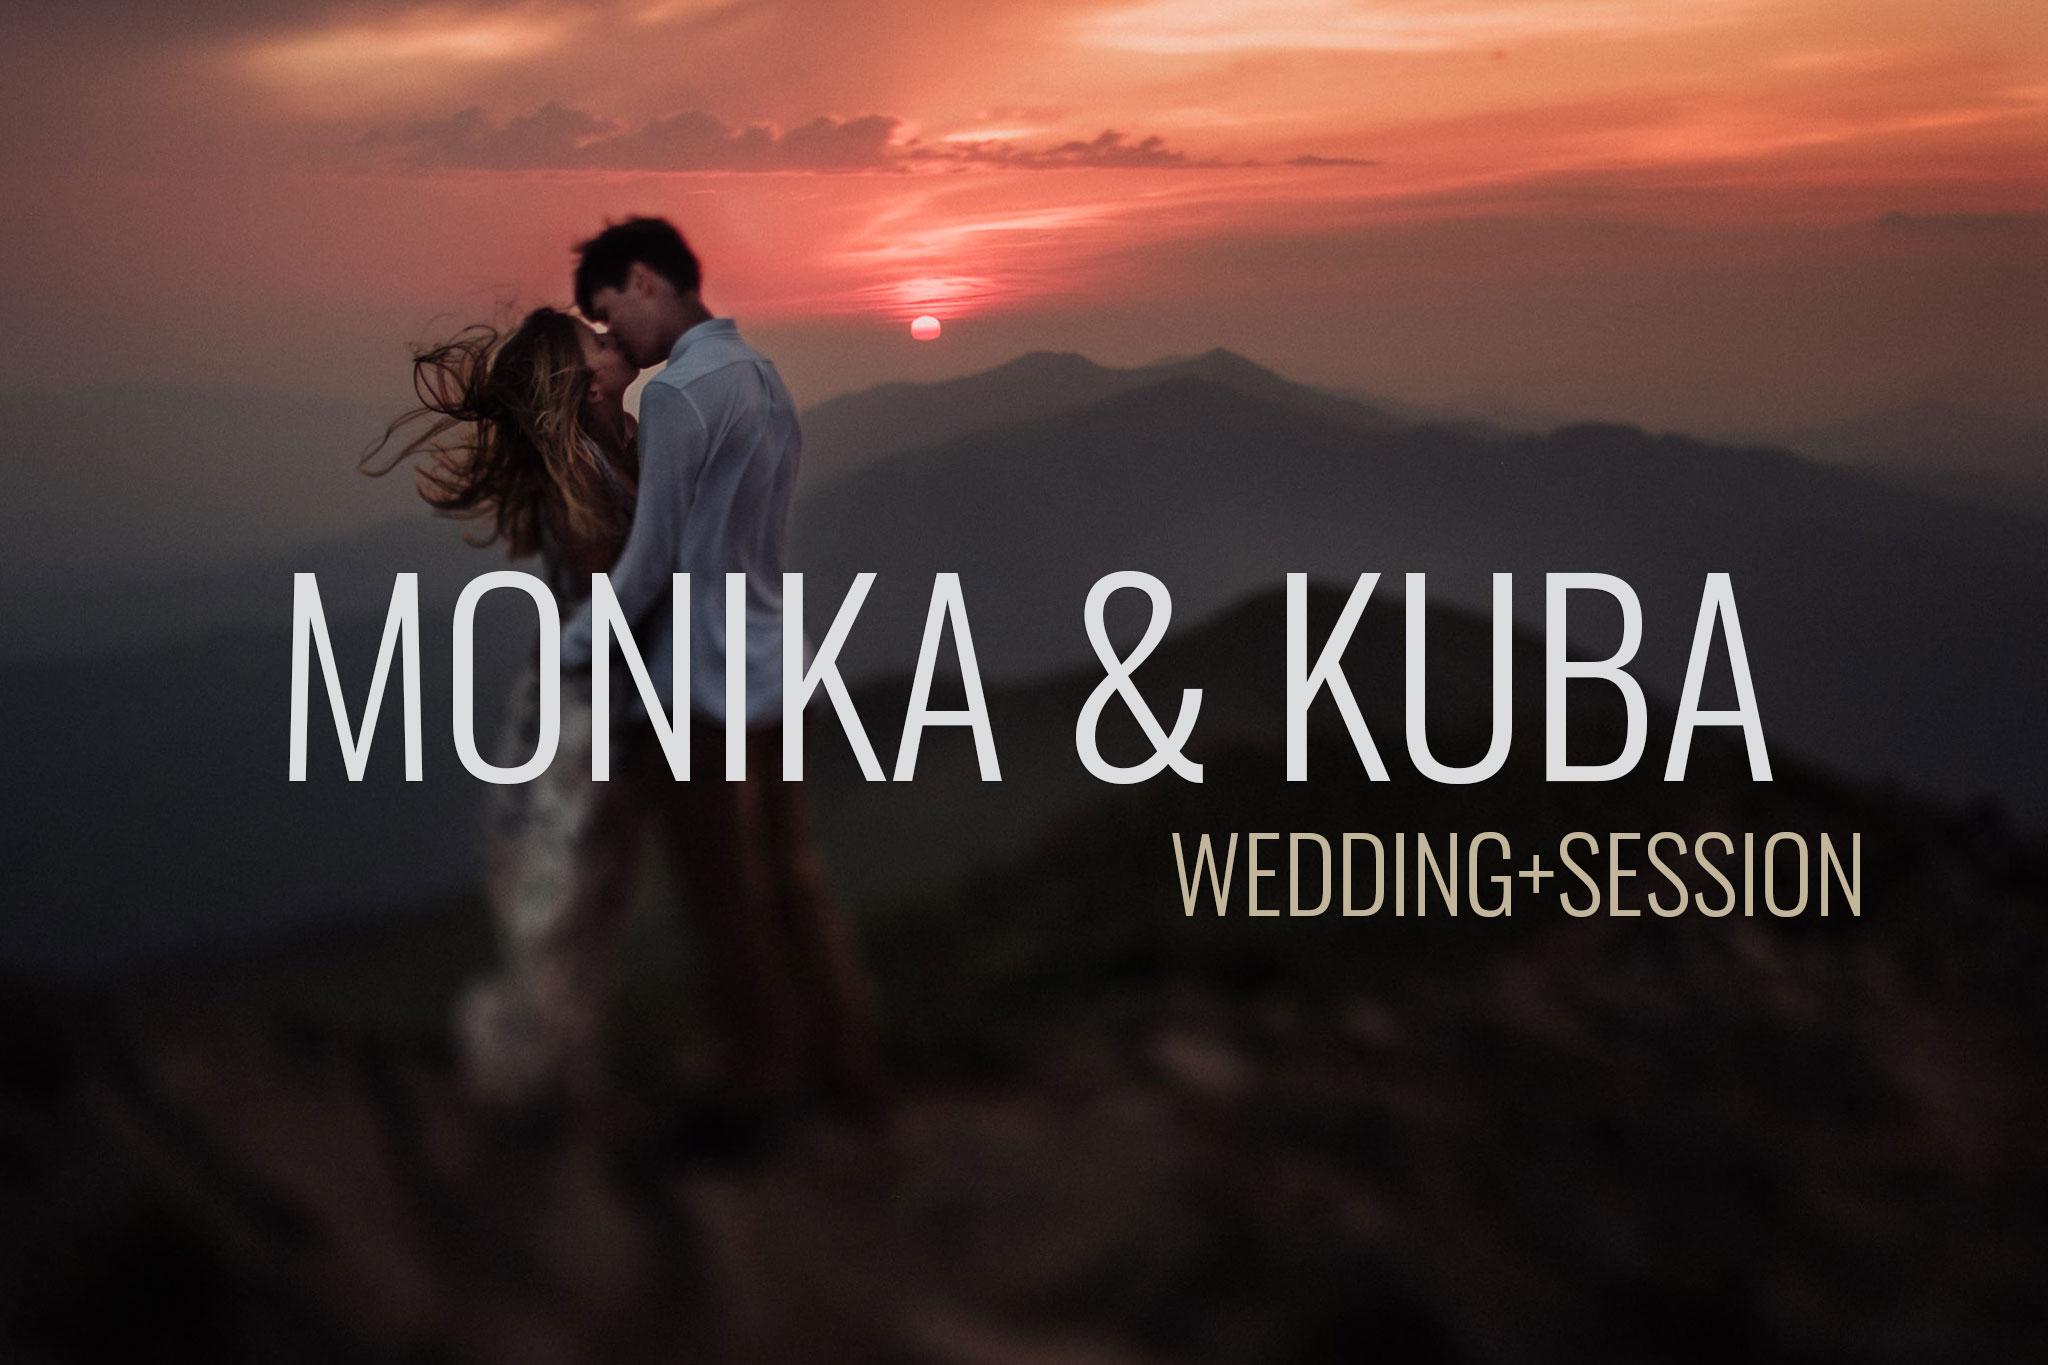 MONIKA-I-KUBA-COVER.jpg